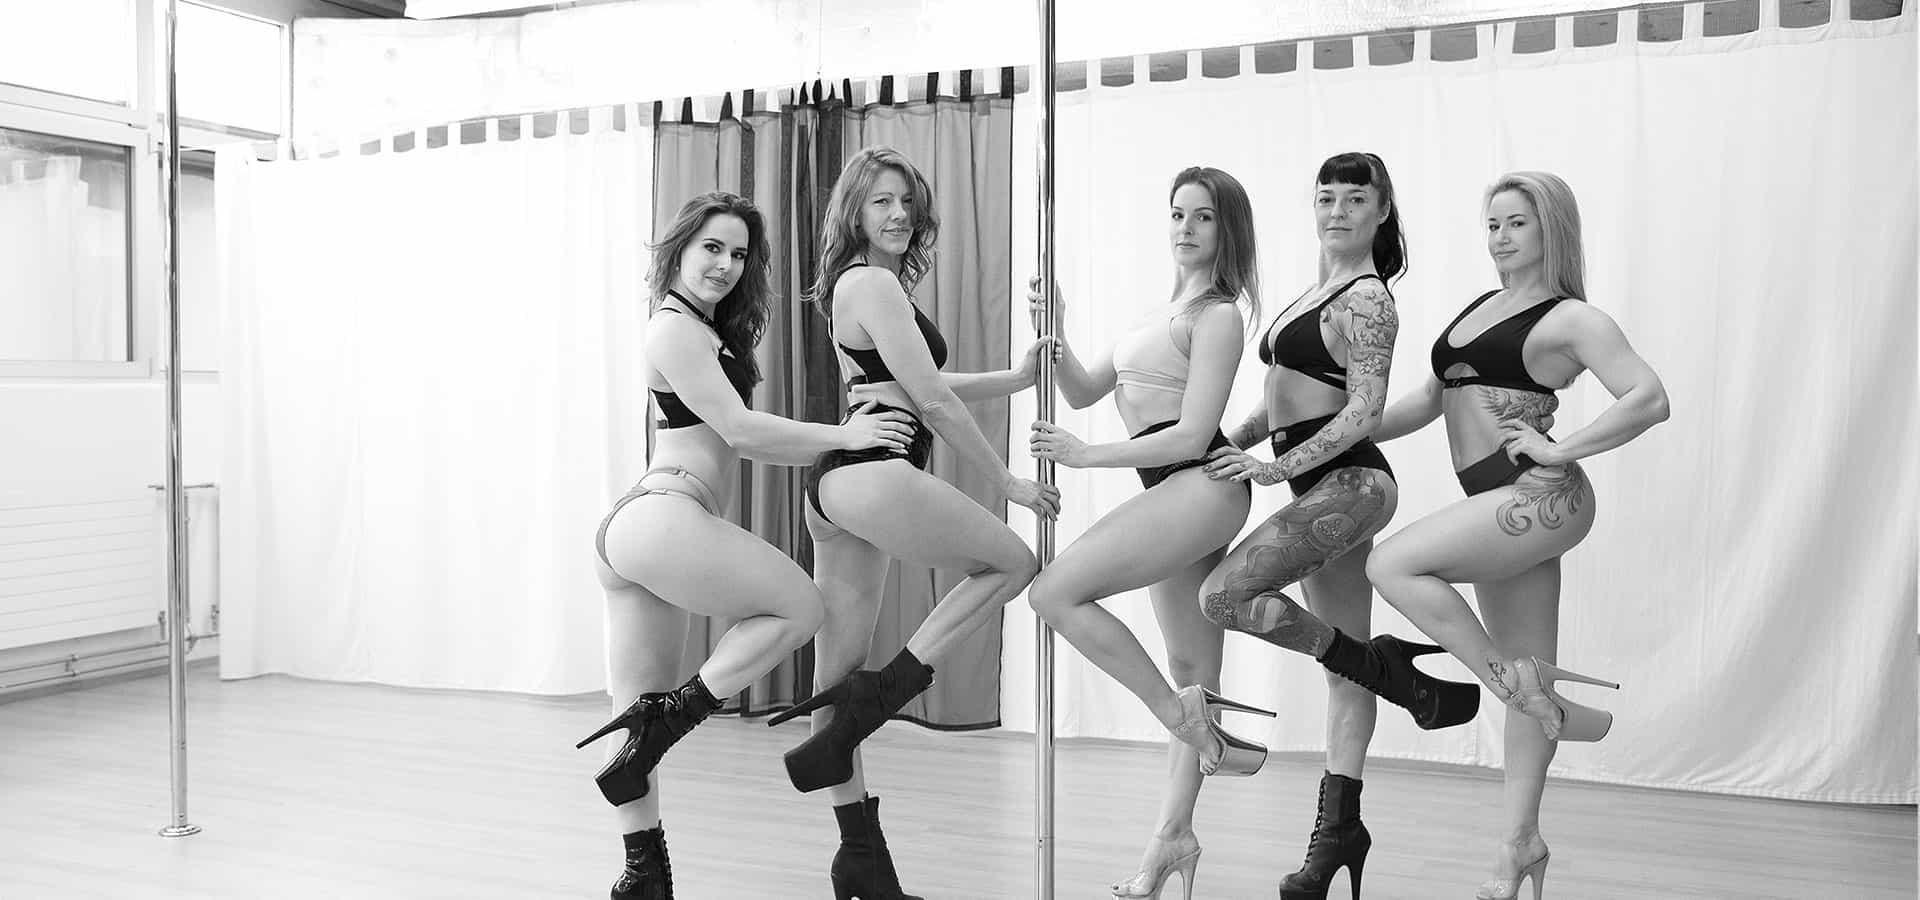 Gravity Arts poledance Team